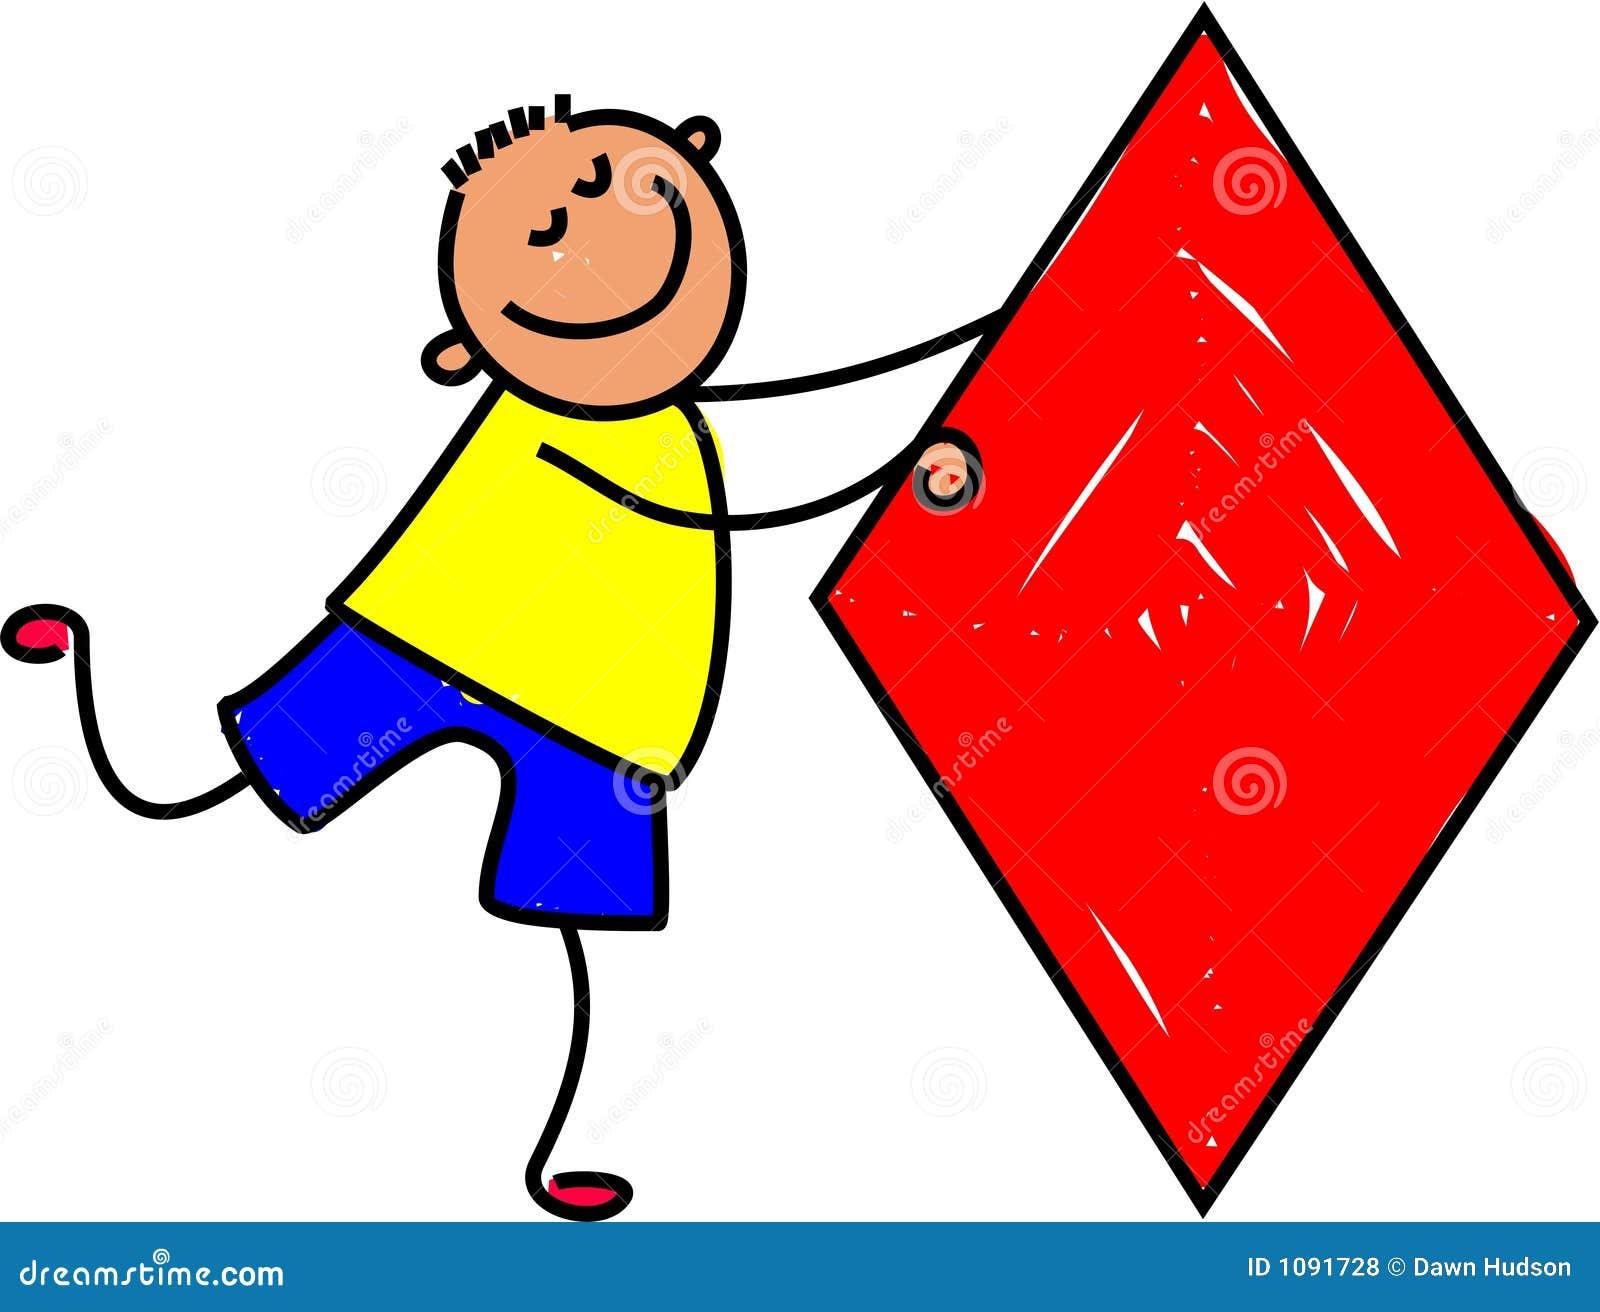 Diamond Kid Stock Vector. Illustration Of Happy, Preschool